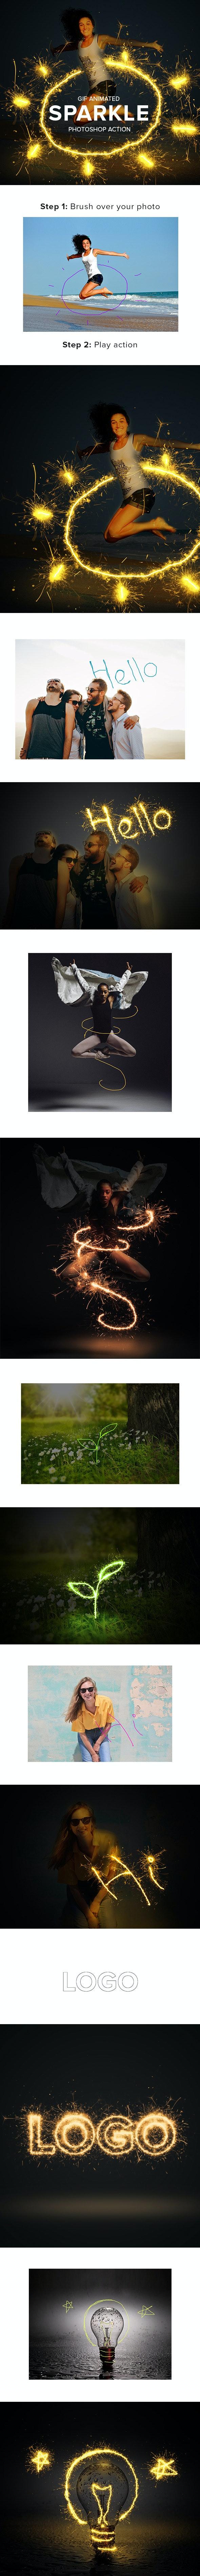 Gif Animated Sparkler Photoshop Action - Actions Photoshop